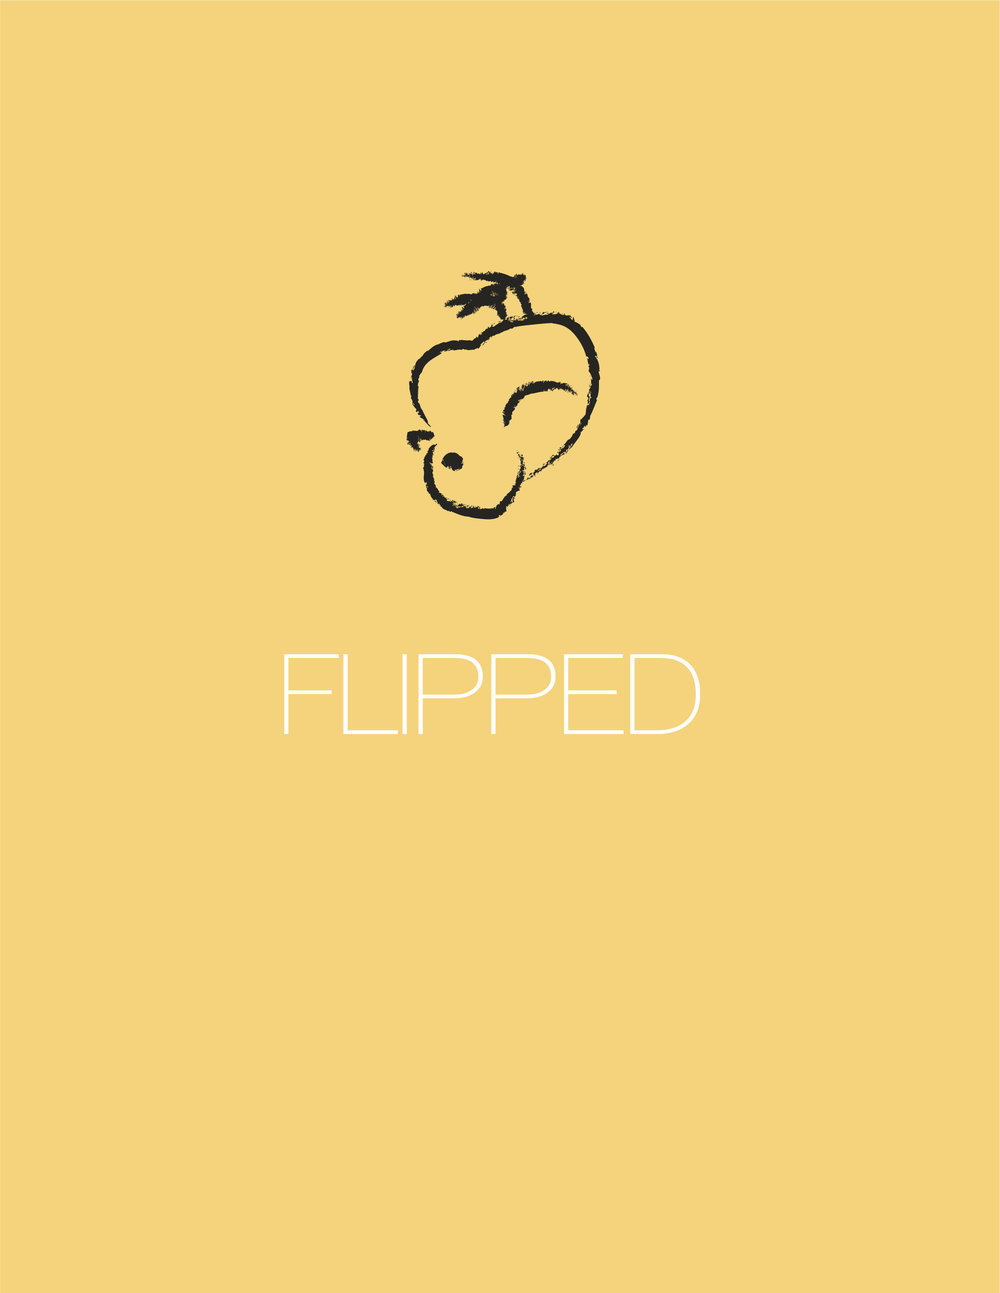 flipped.jpg